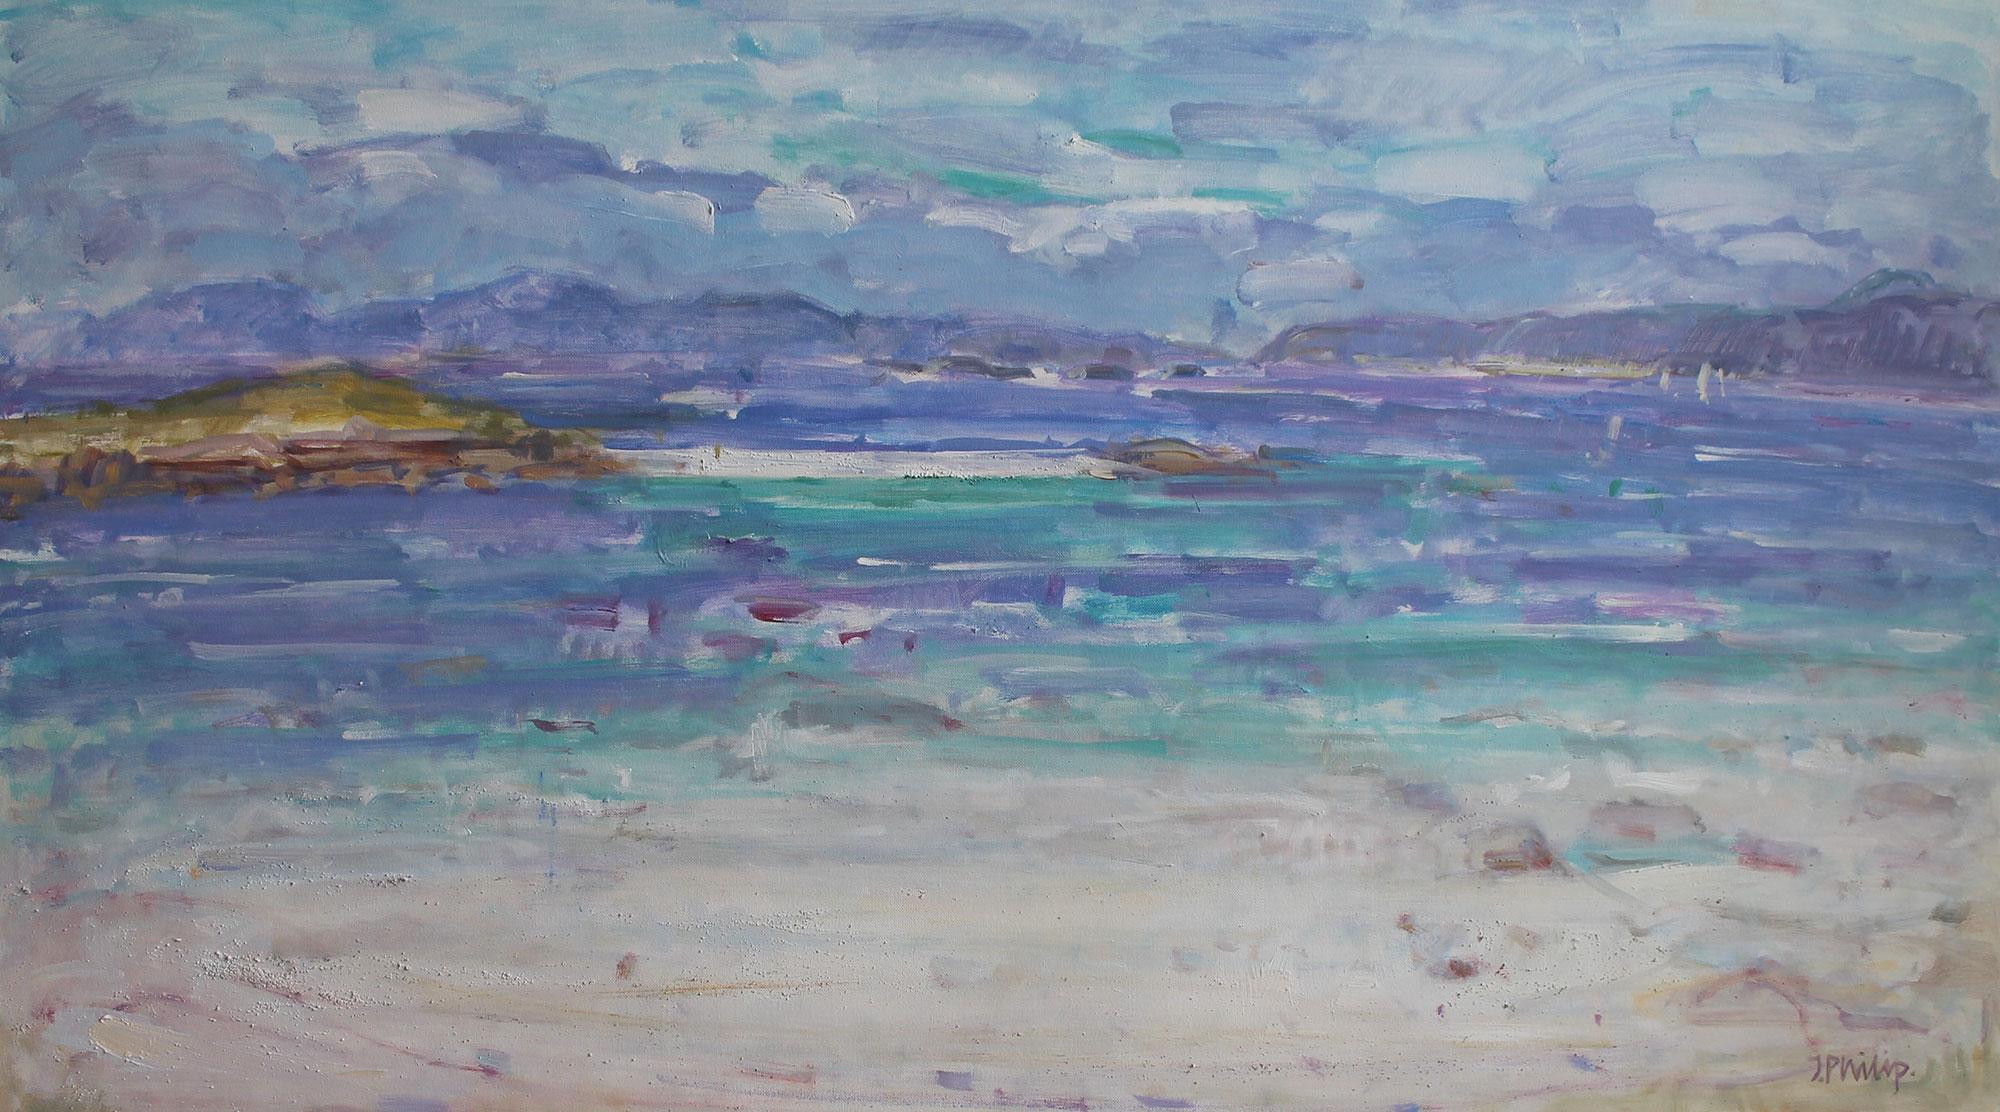 Jackie Philip The Monk's Strand, Iona